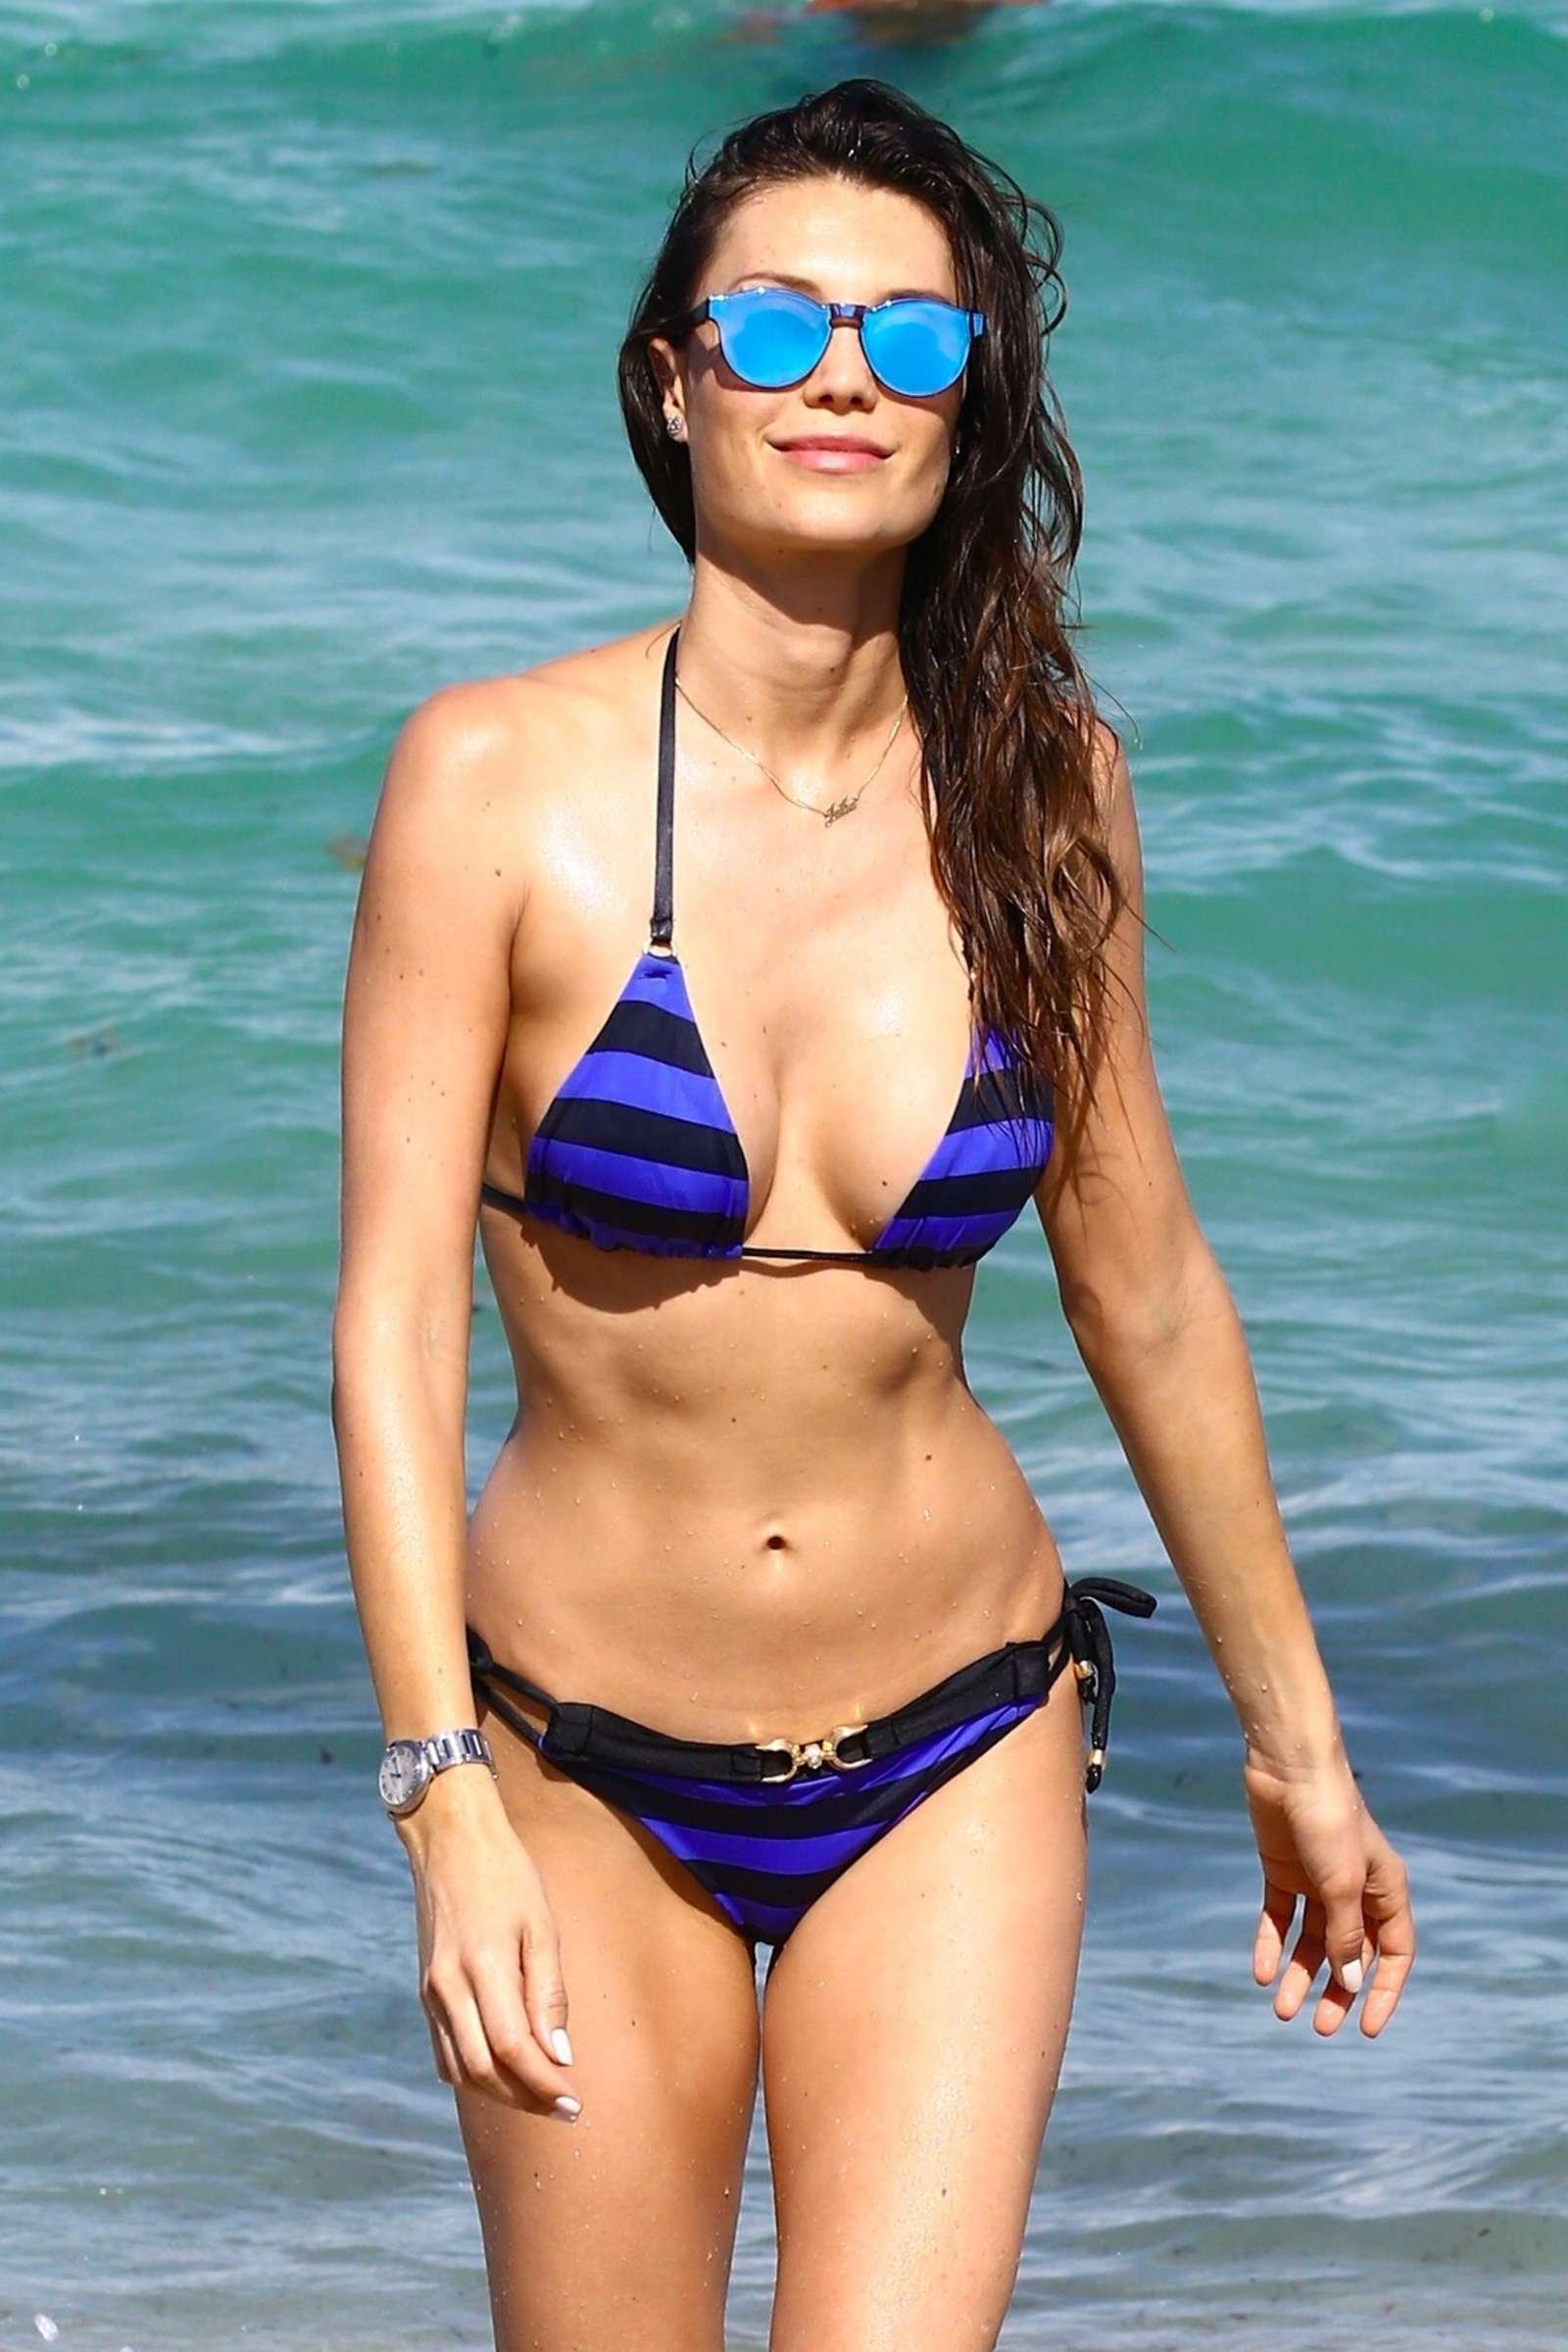 Video Yuliya Lasmovich nudes (31 foto and video), Ass, Paparazzi, Twitter, butt 2019